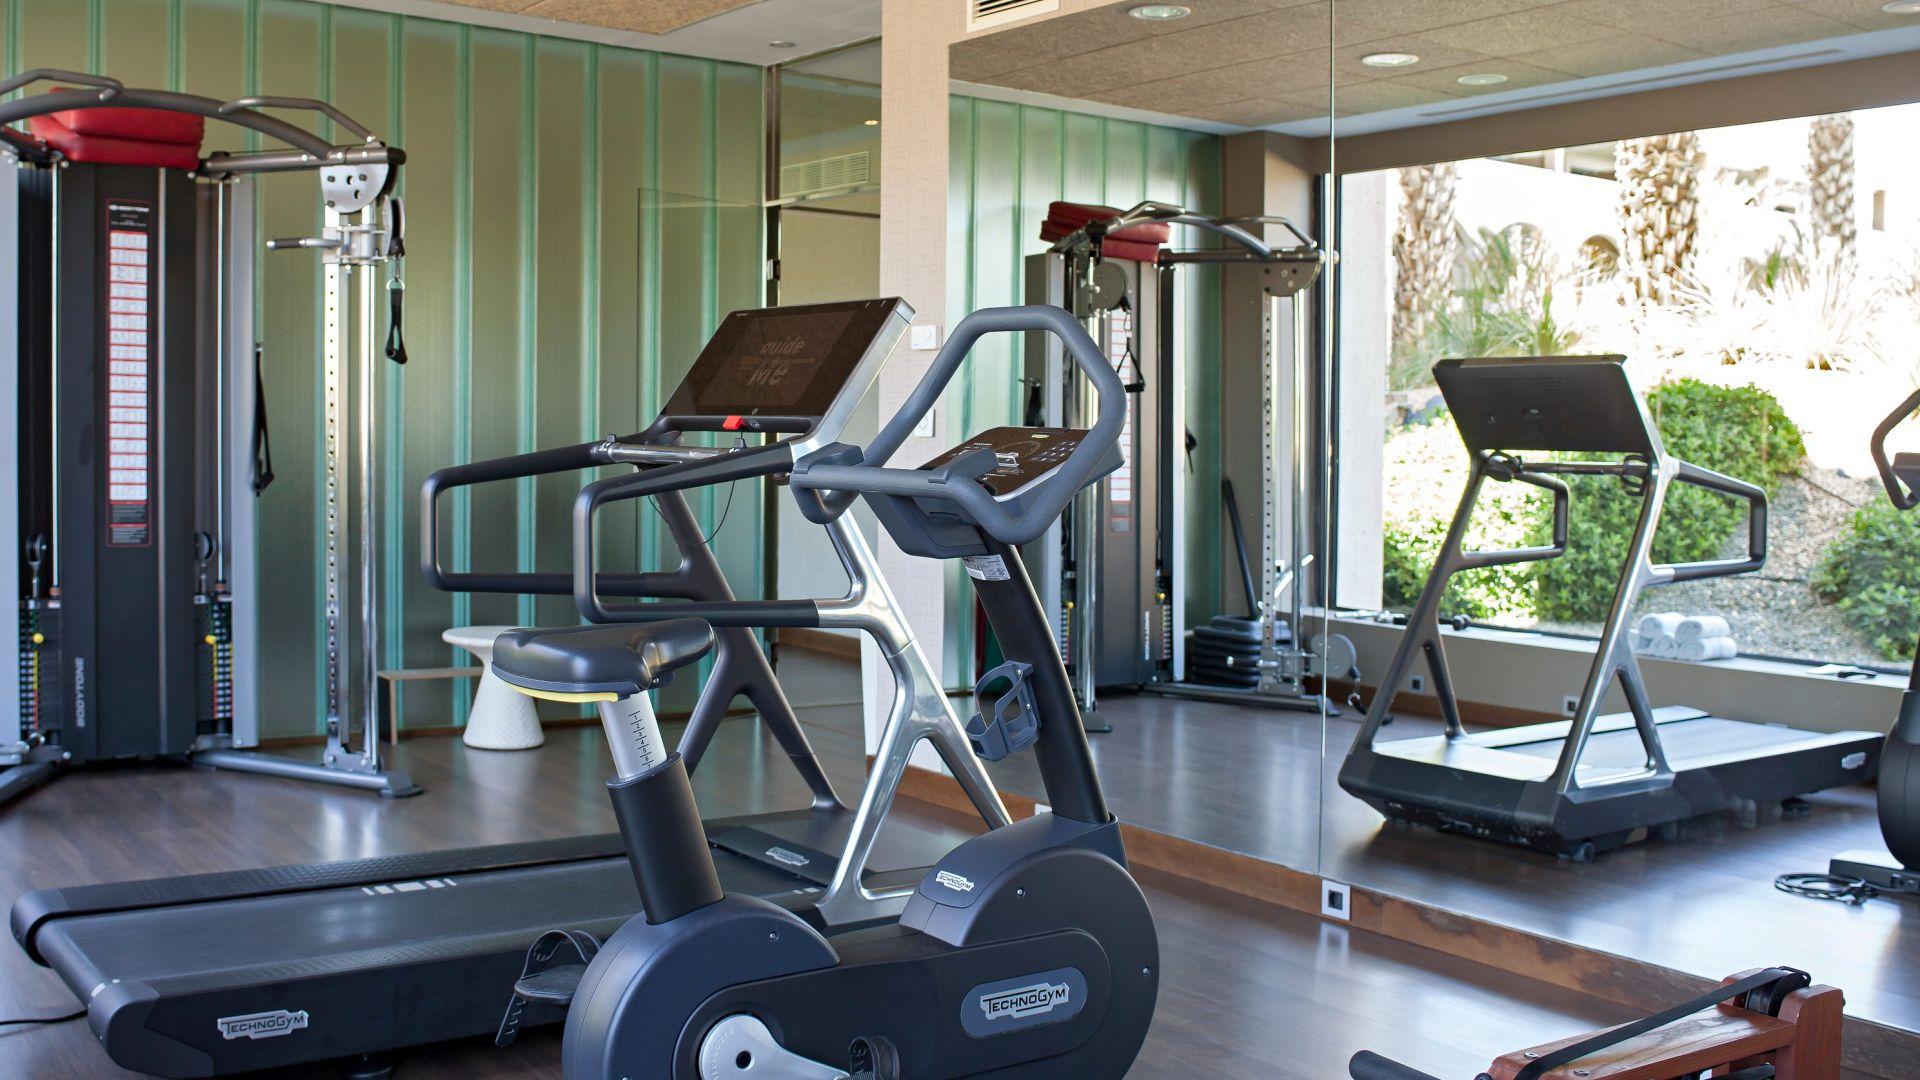 Gimnasio 24 horas abierto te animas a hacer ejercicio for Gimnasio 24 horas logrono